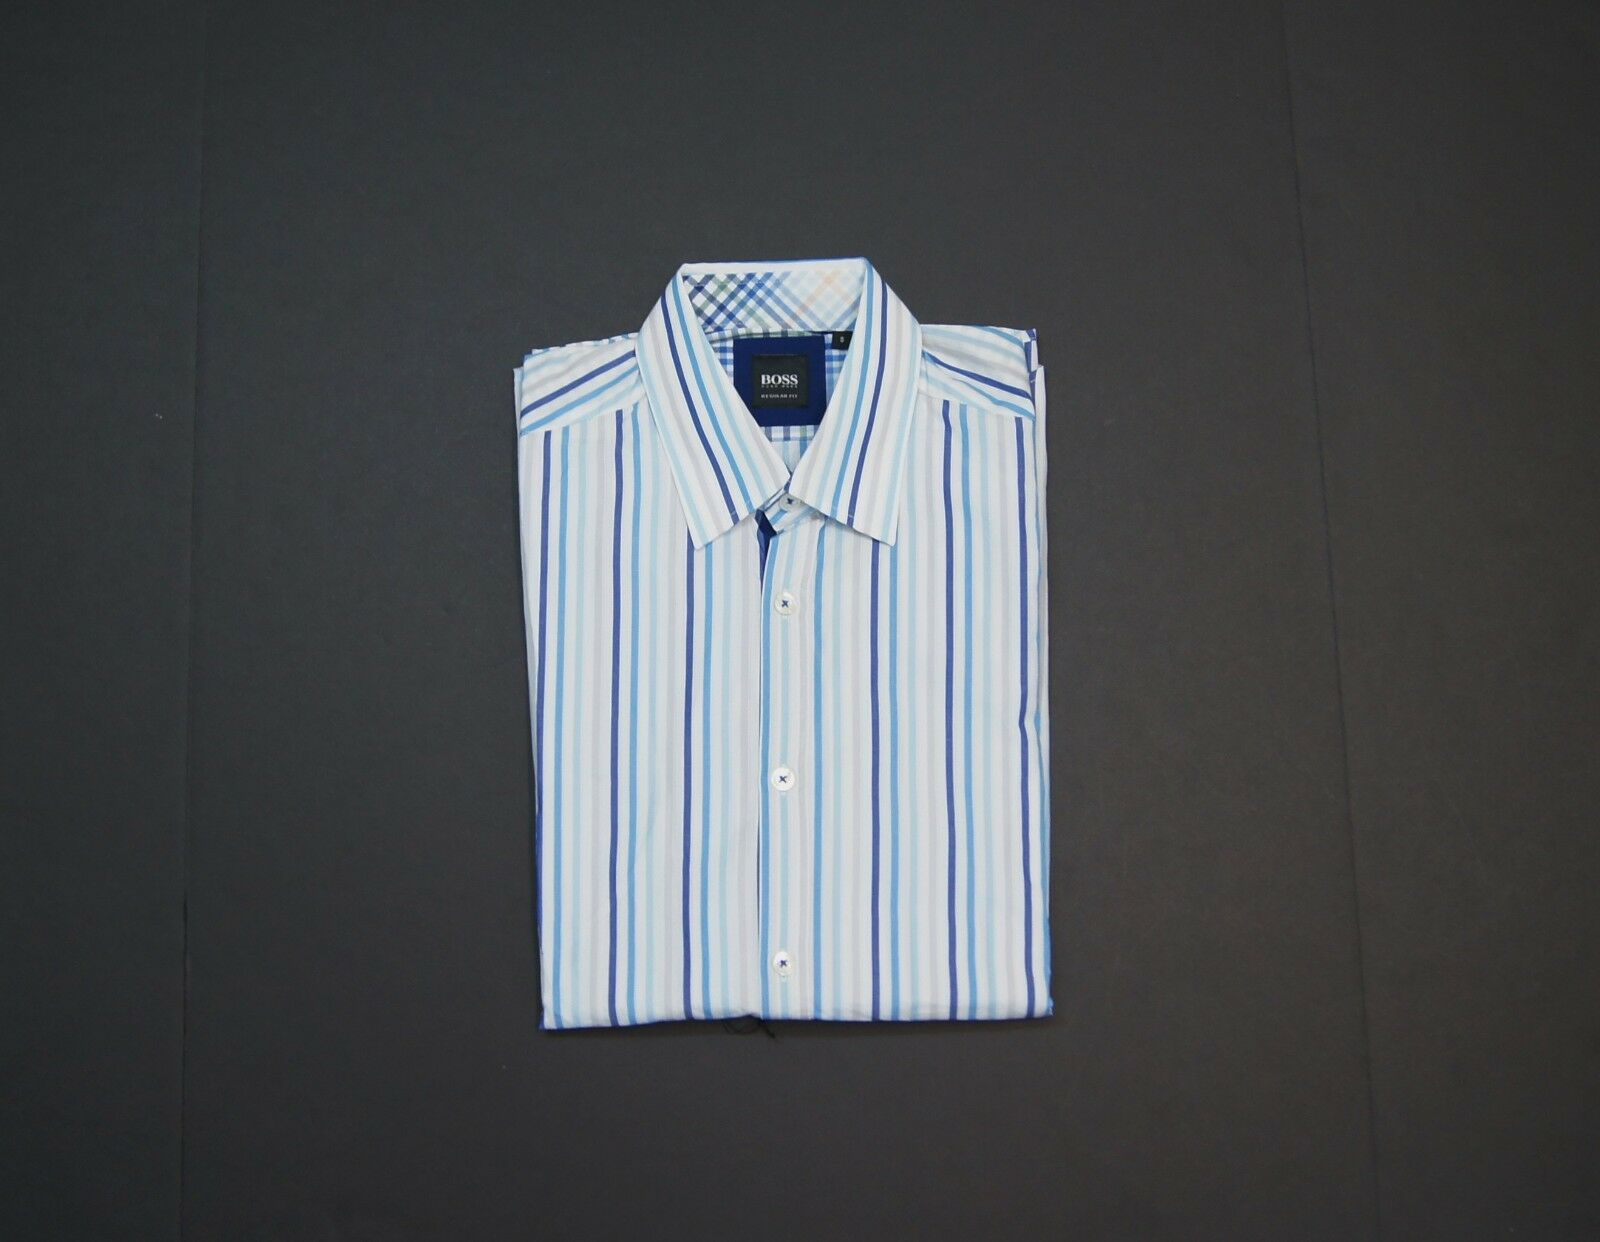 HUGO BOSS  Obert Regular Fit Multi-color Stripe Casual Shirt size S NEW NWT